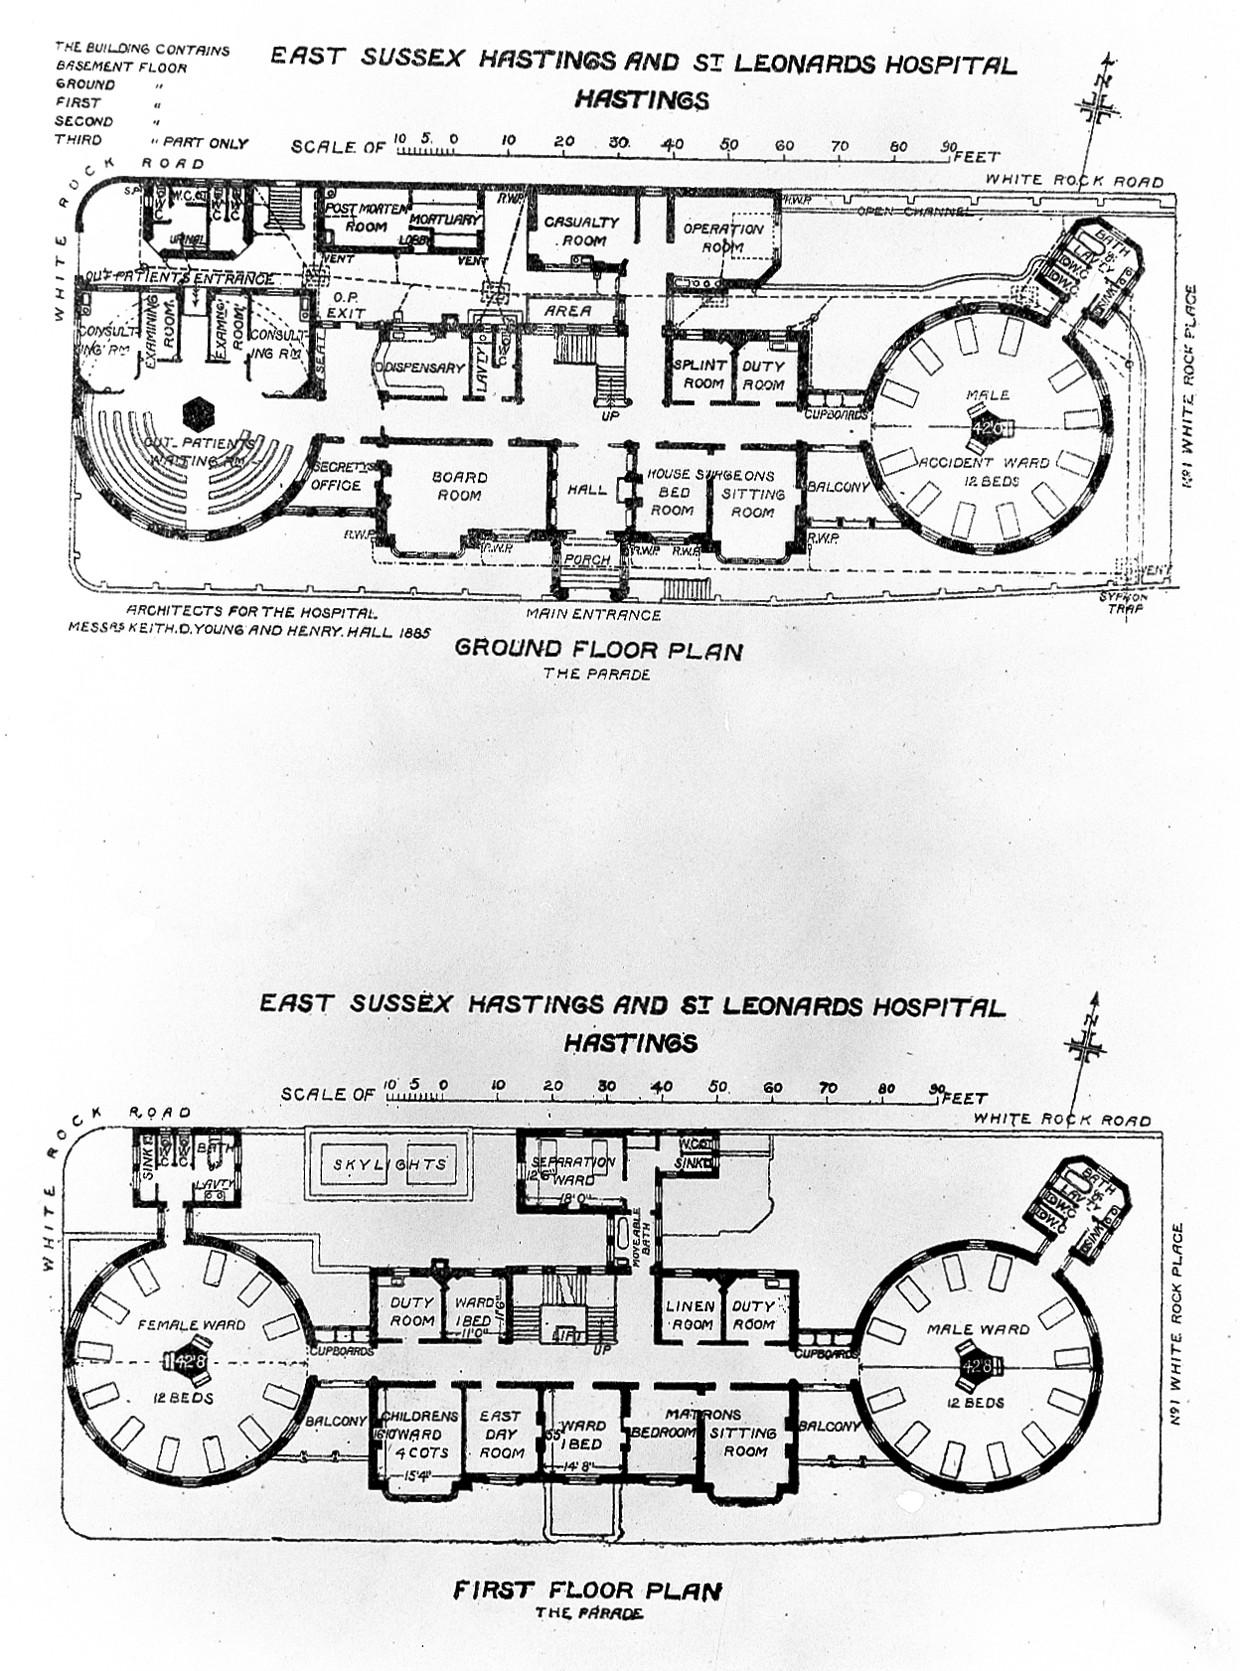 100 Floor Plan Of Hospital Paranjape Azure A C D E  : PlansofESussex2CHastingsandStLeonard27shospitalsWellcomeL0011765 from jojogor.com size 1240 x 1671 jpeg 567kB